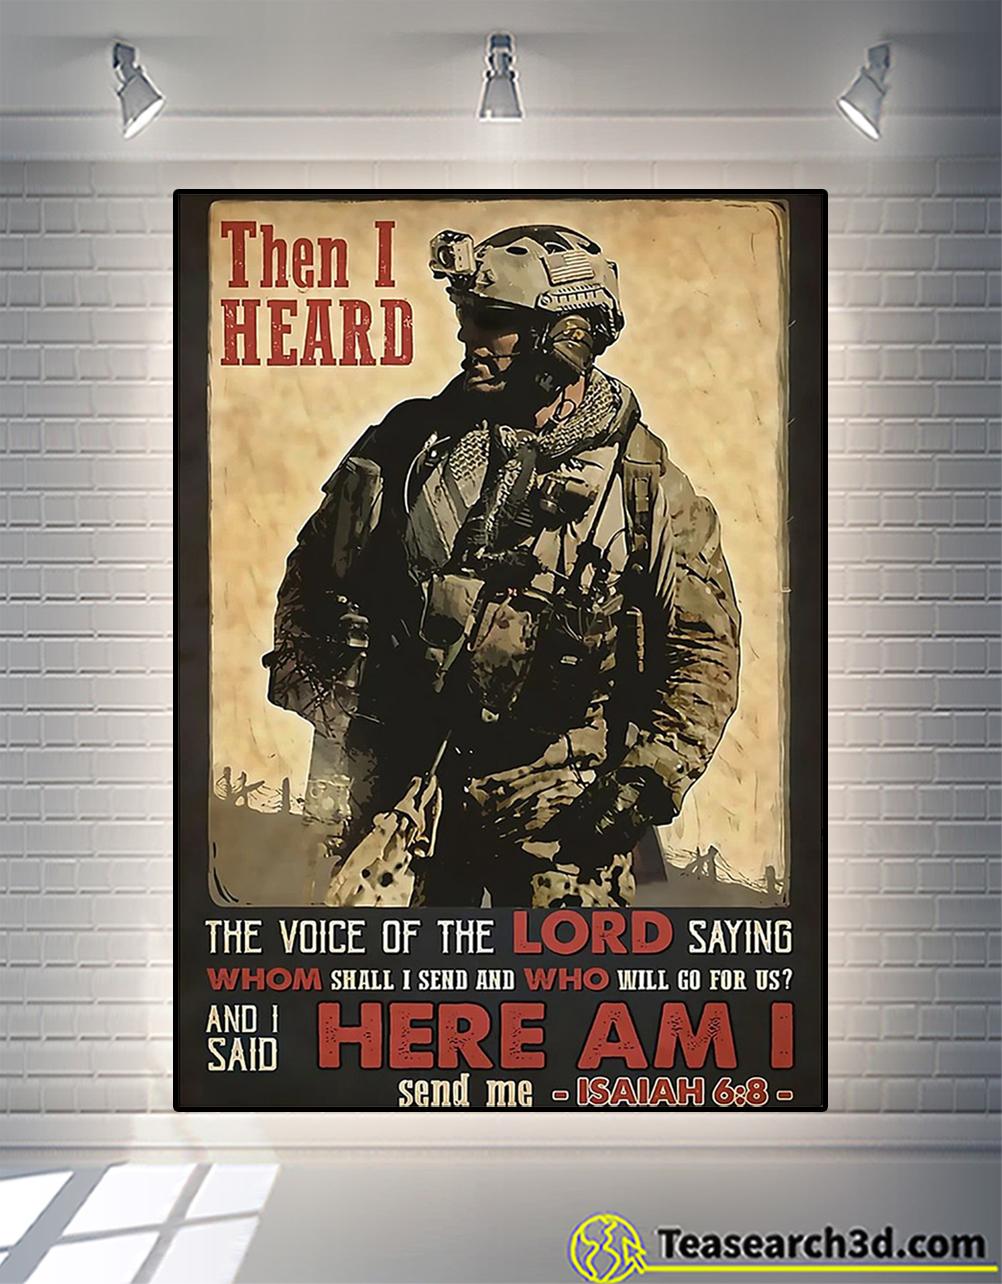 Veteran then I heard here am i poster